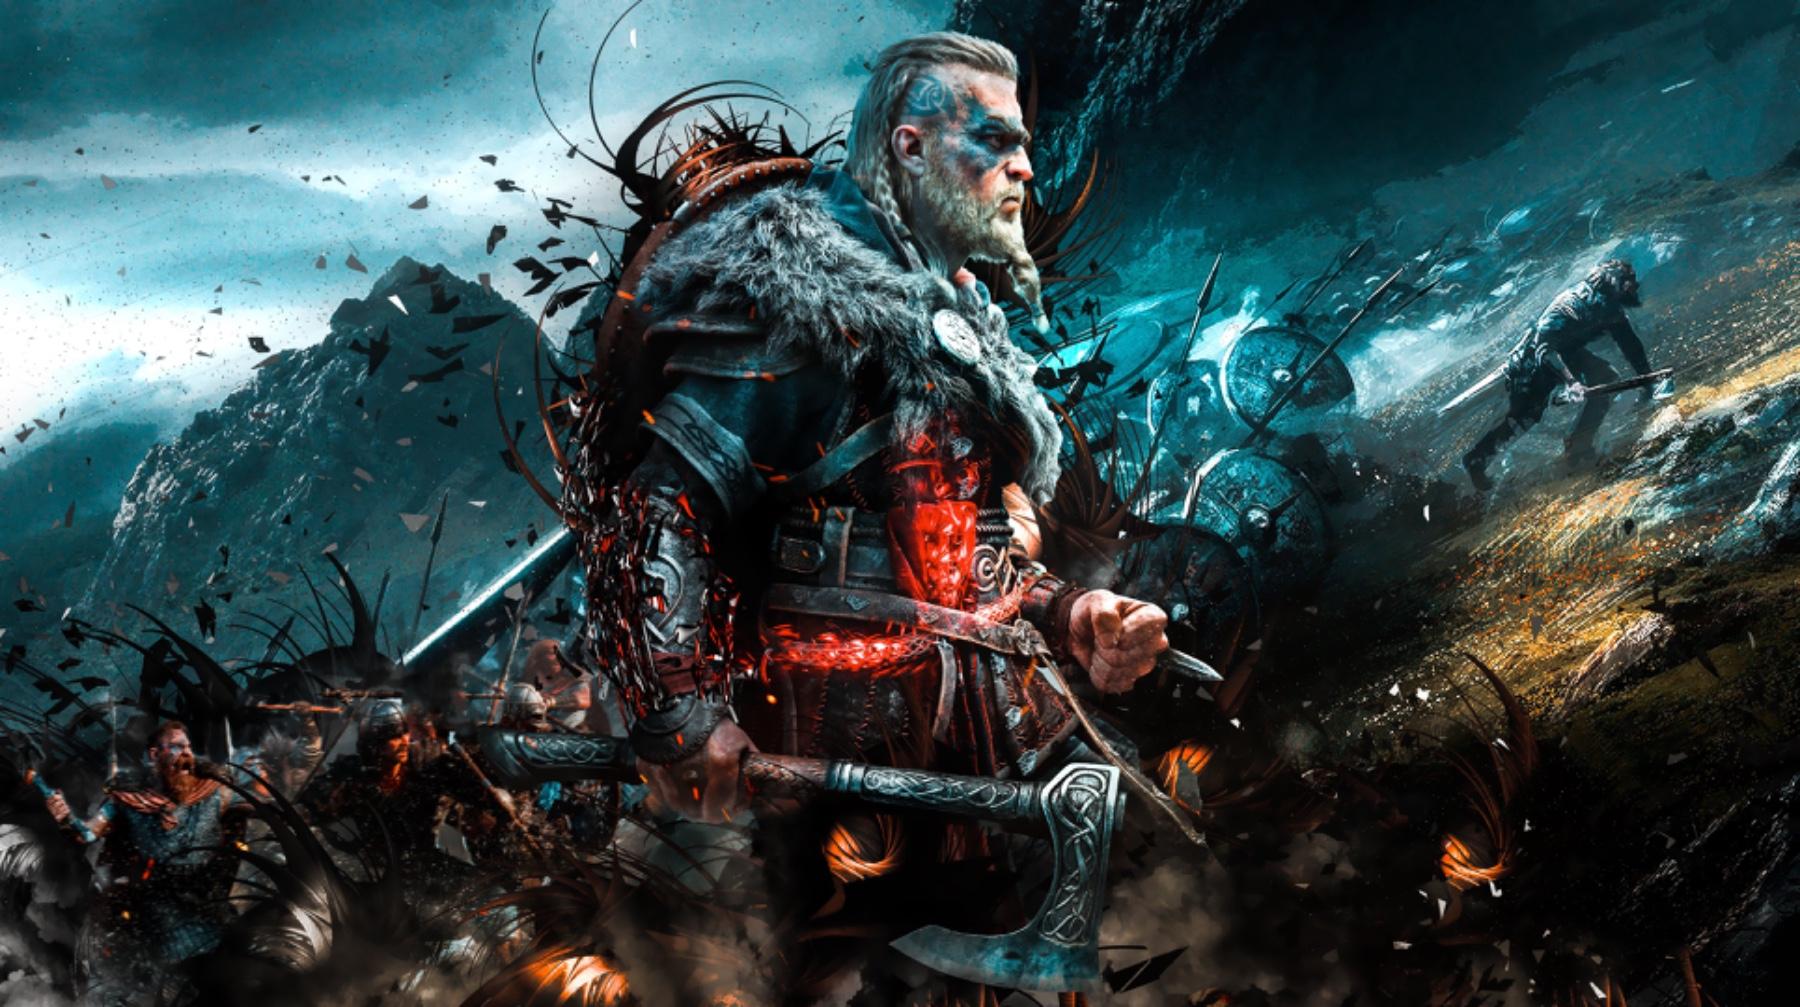 Assassin's Creed: Valhalla vichingo in game